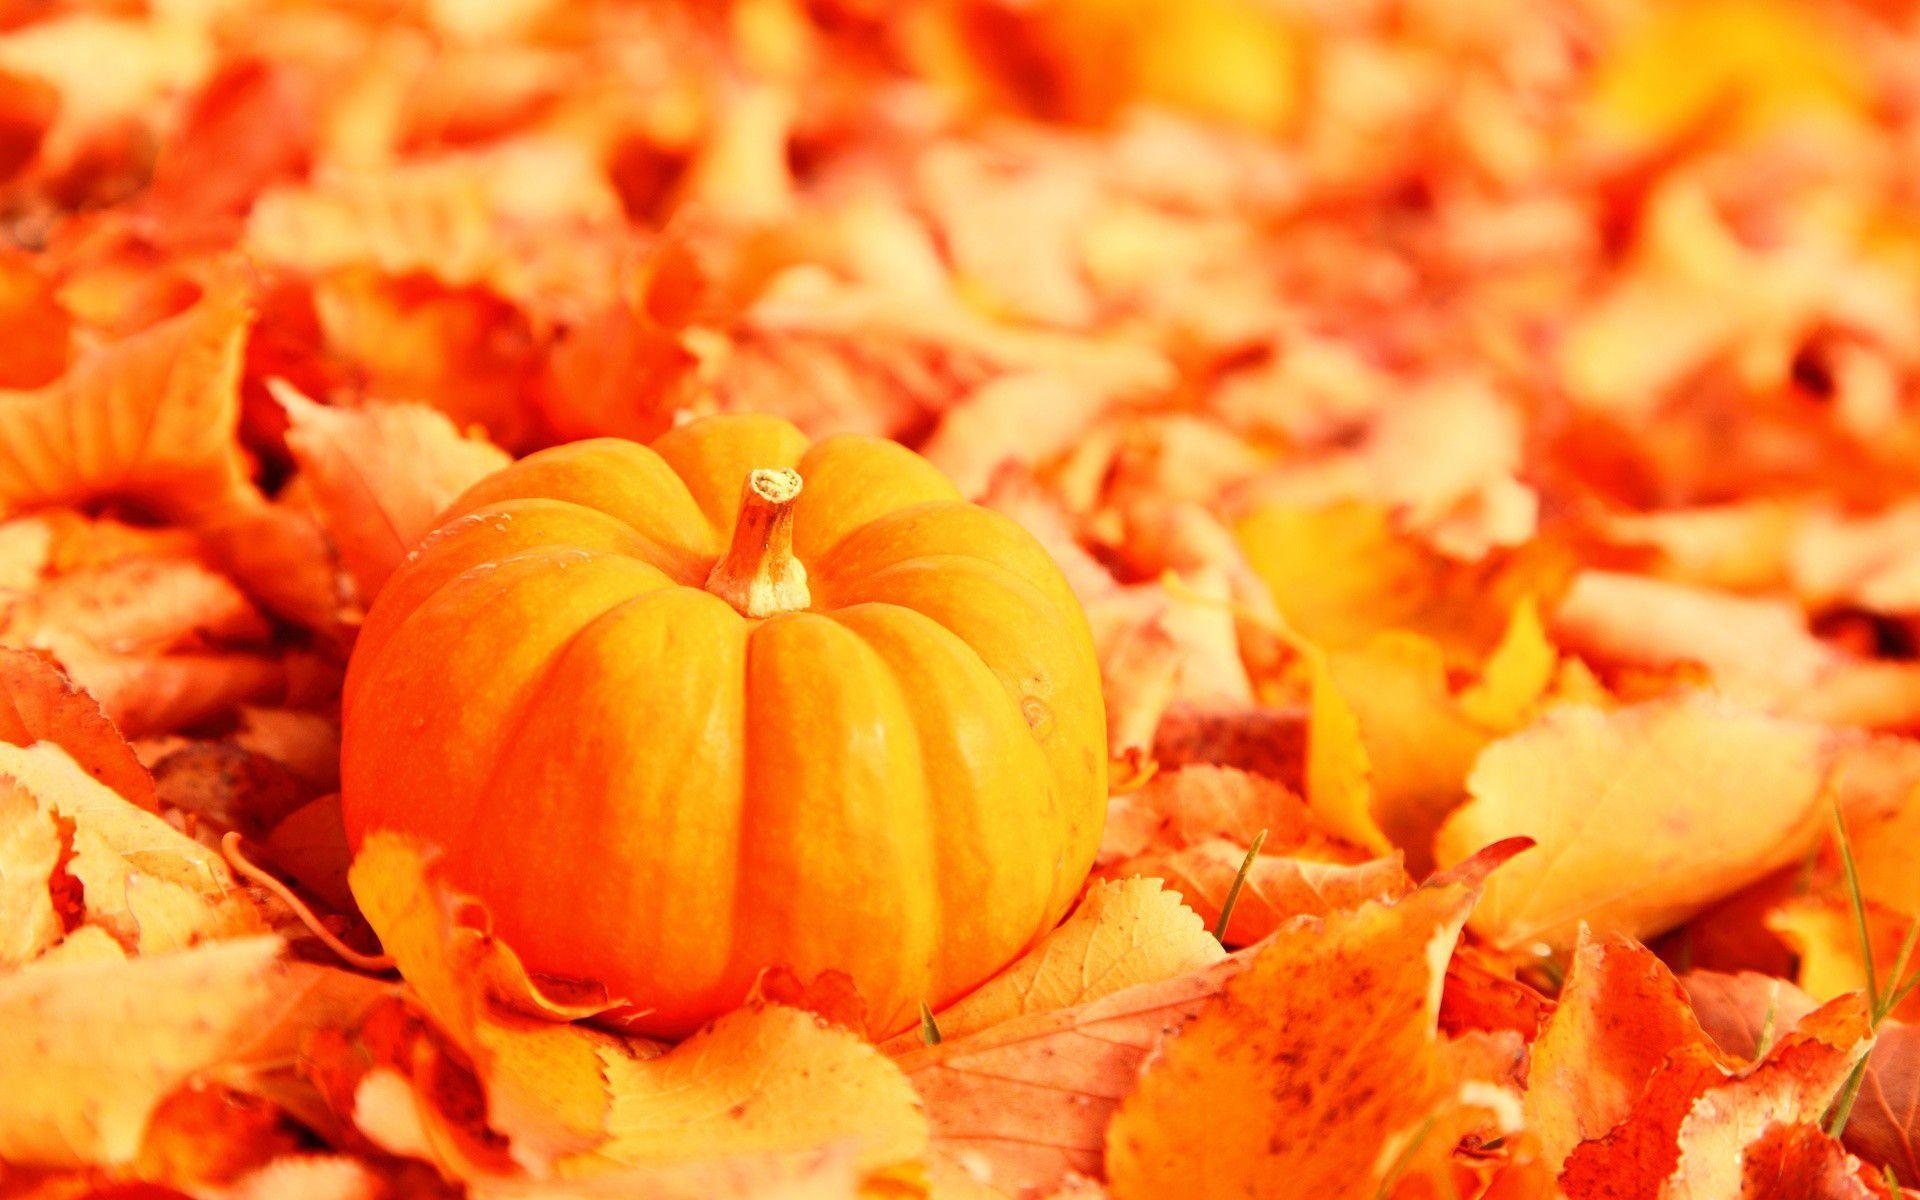 Free Pumpkin Wallpaper Backgrounds - Wallpaper Cave